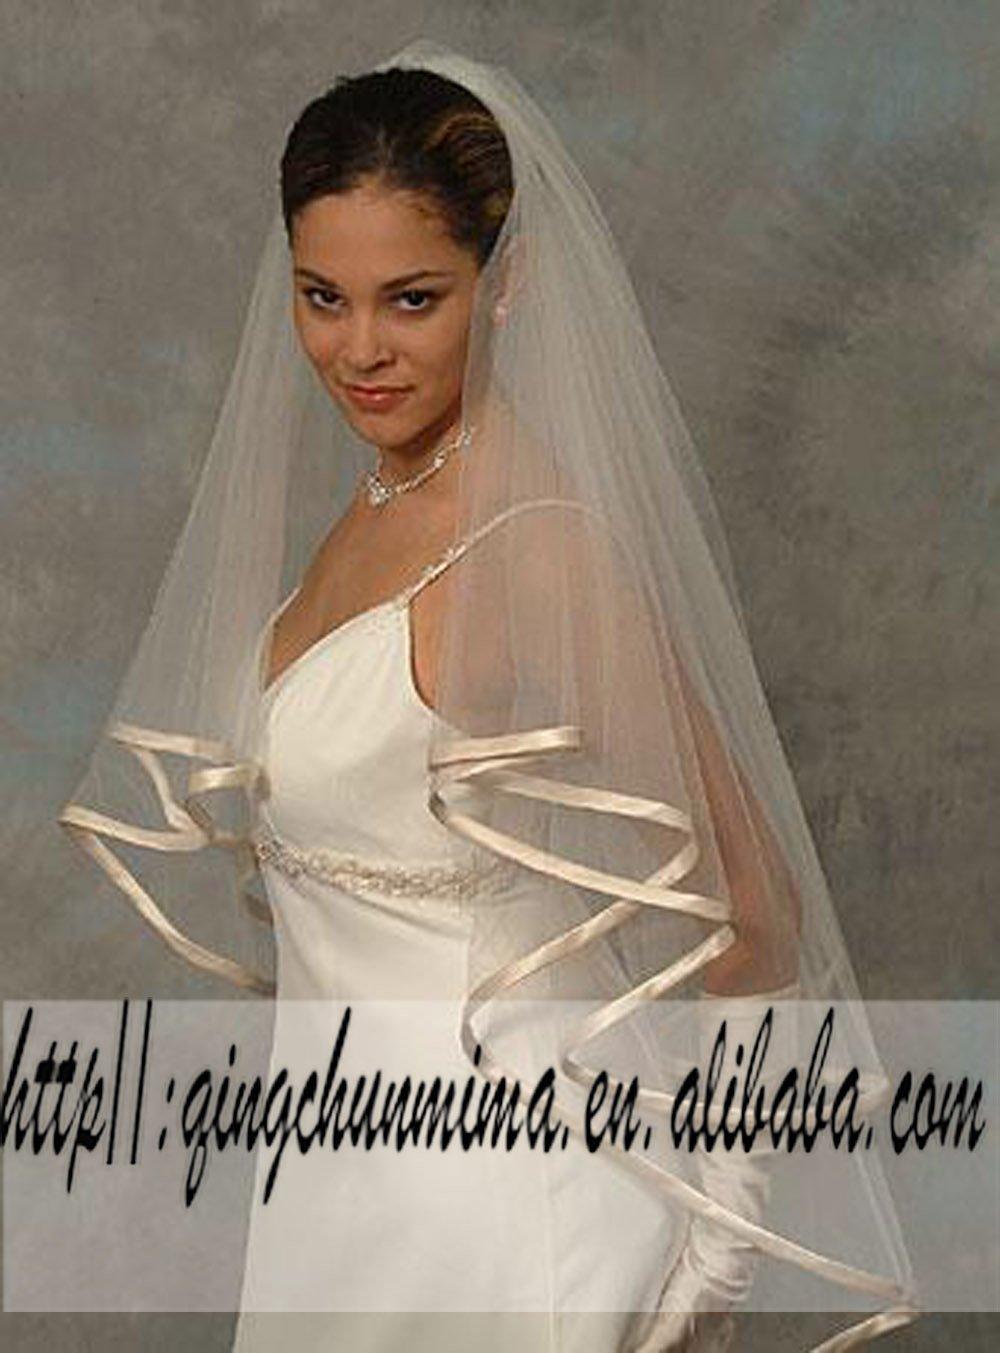 Pernikahan Outdoor Agar Anda Mungkin Bermimpi Suatu Mendapatkan